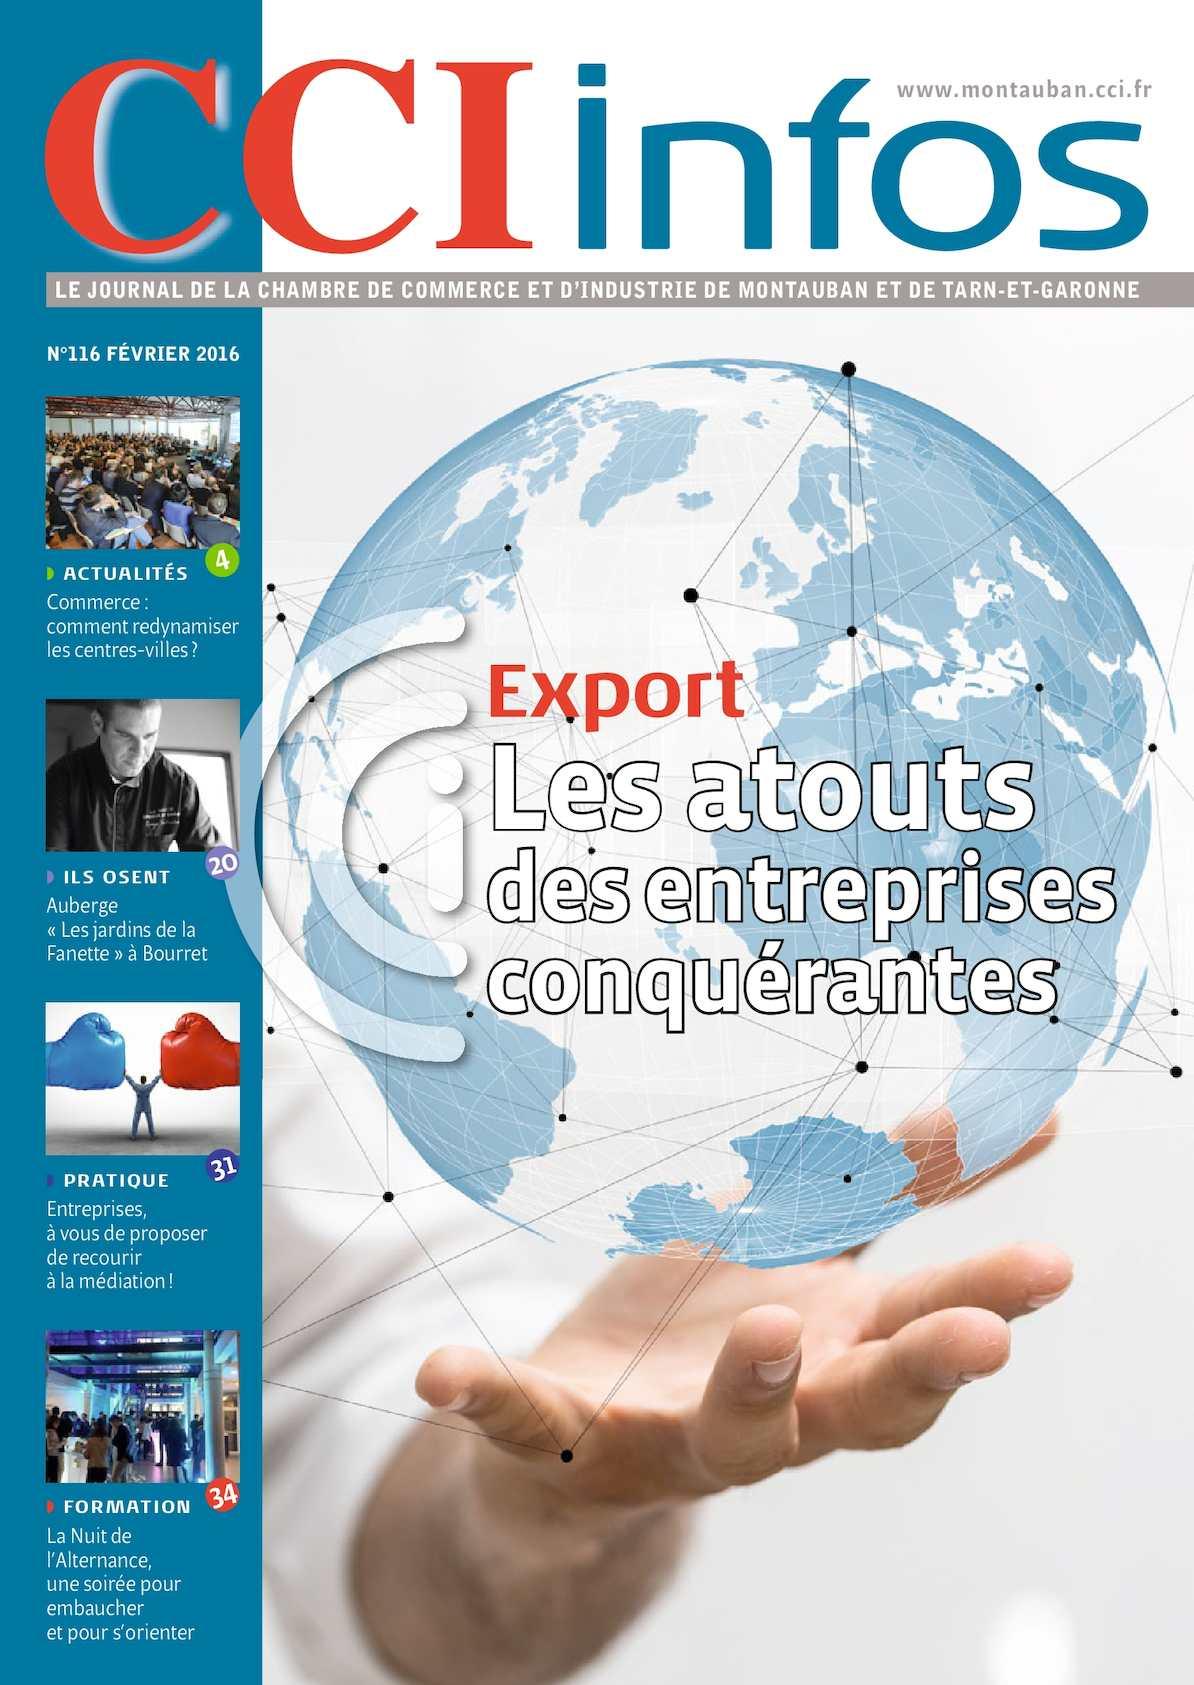 Calam o cci infos janvier 2016 for Chambre de commerce montauban